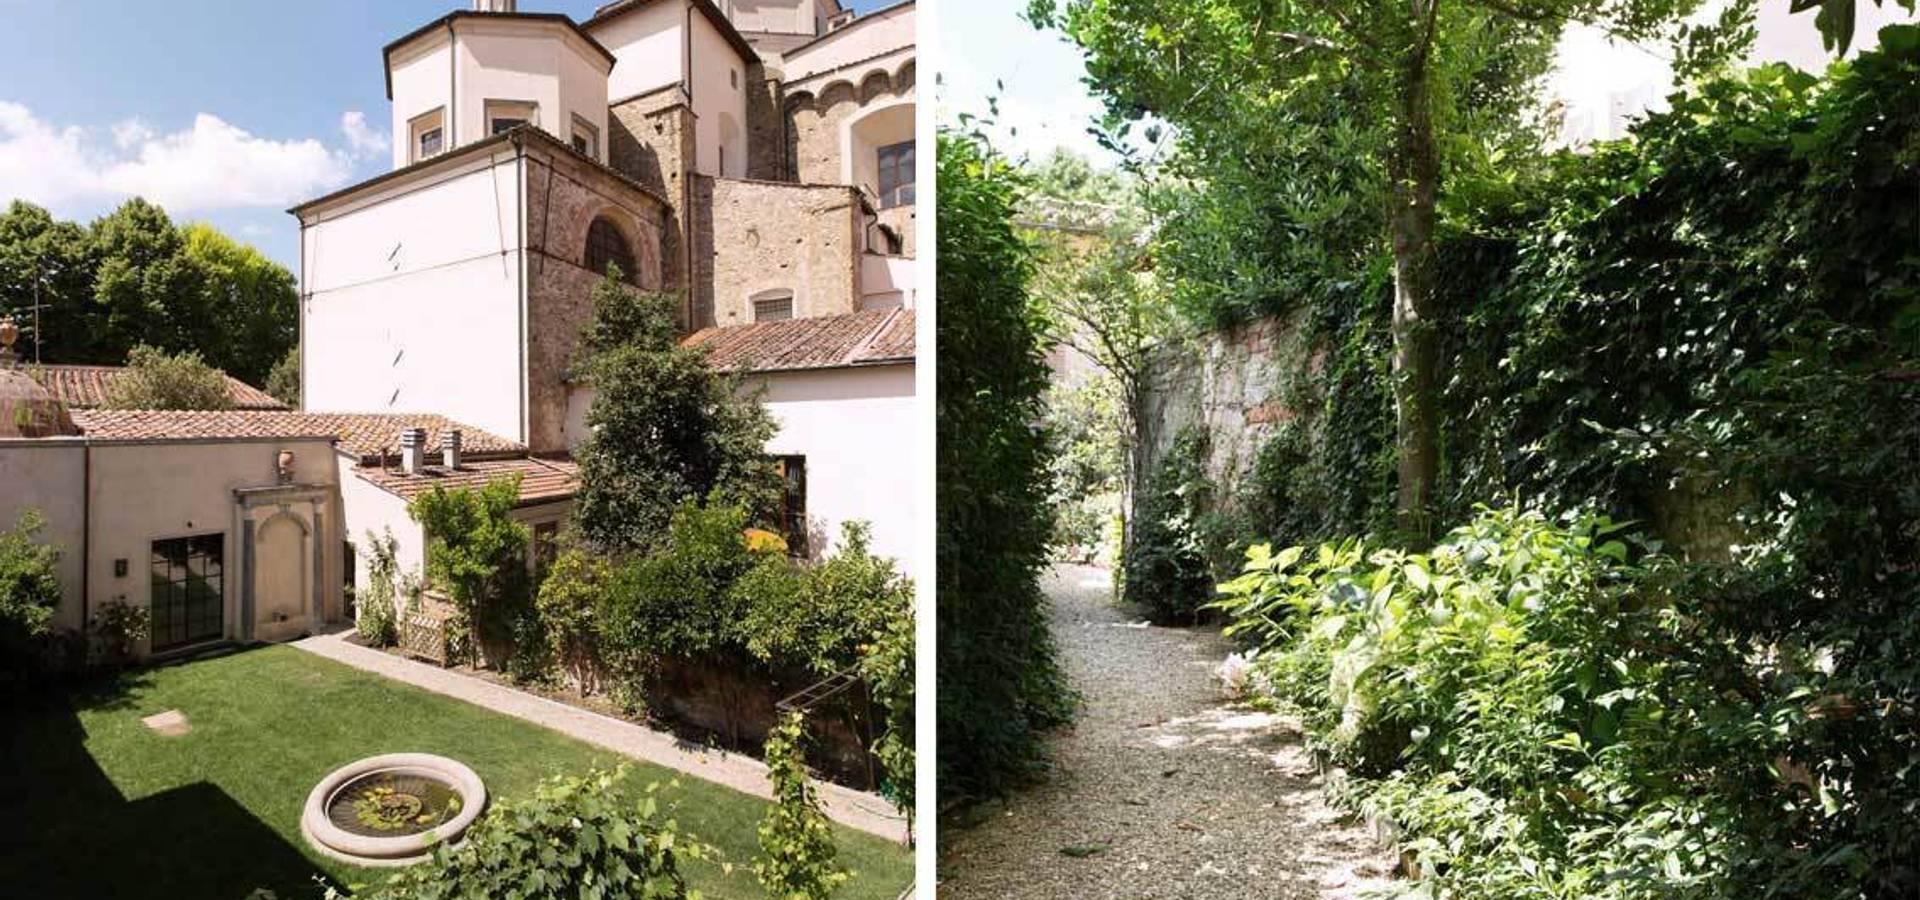 Luigi Fragola Architects